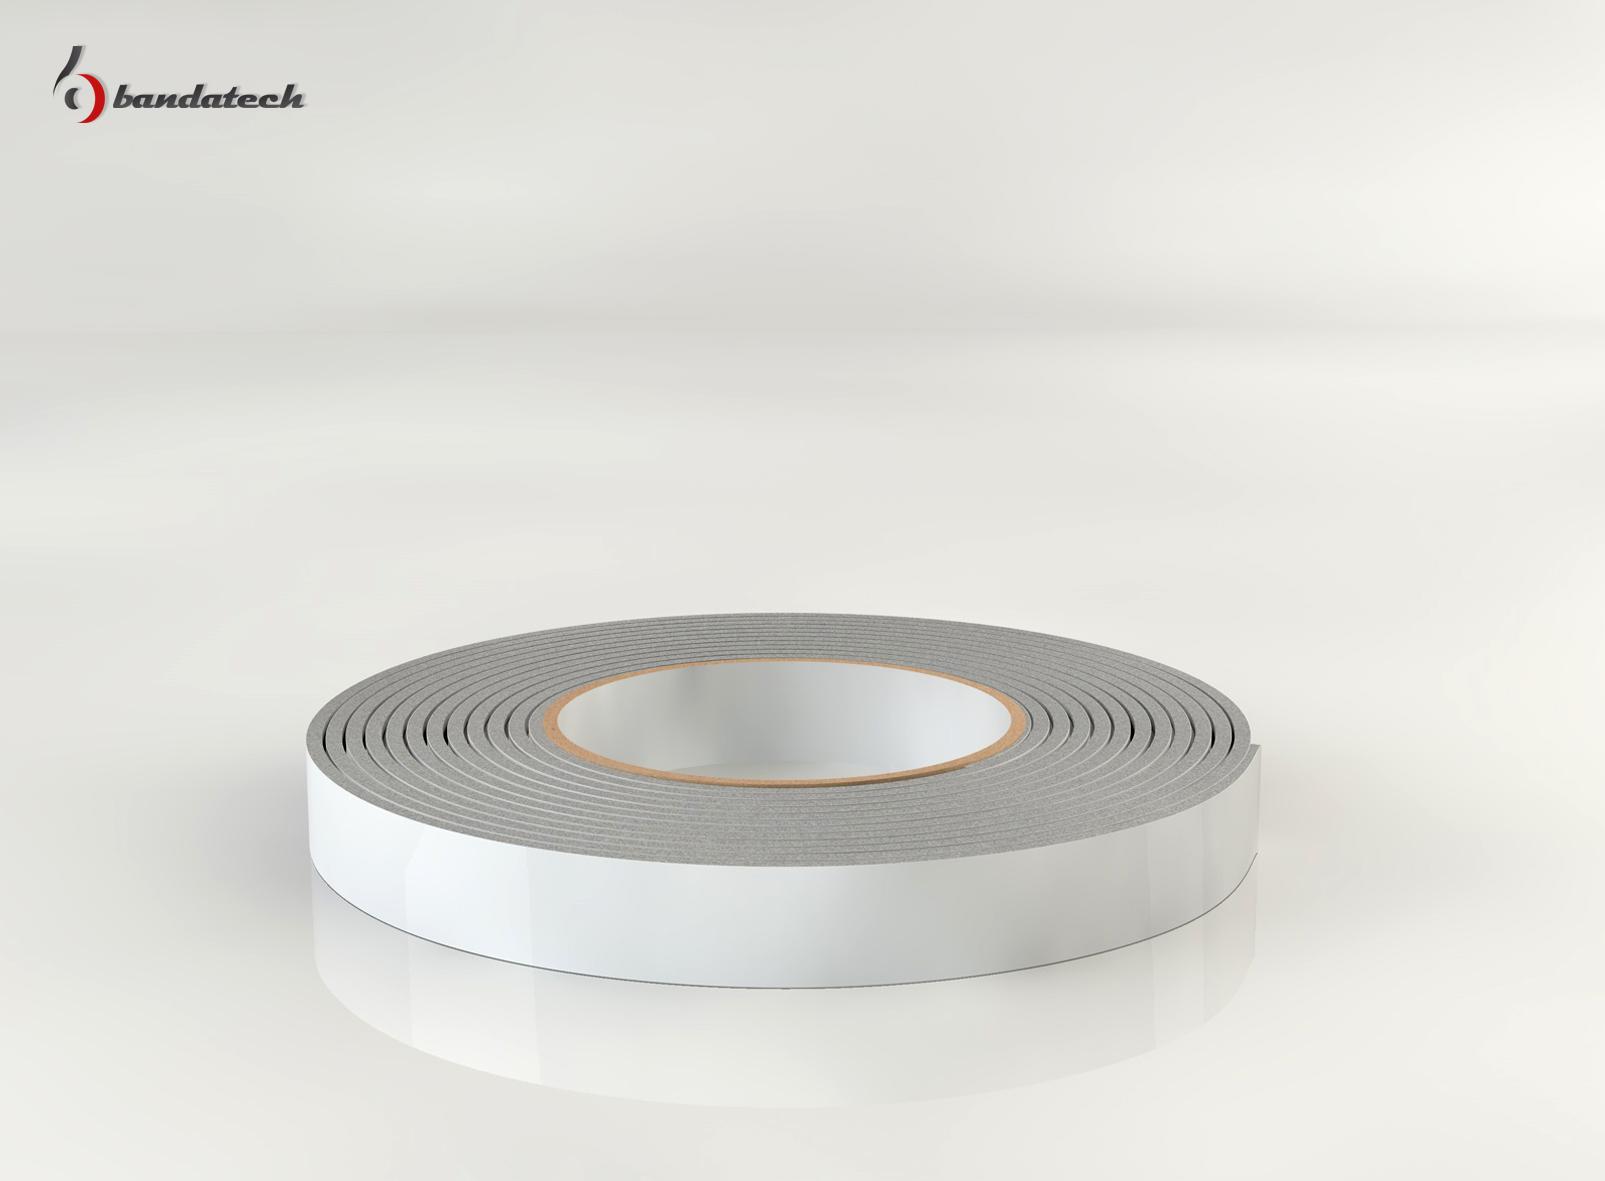 Garnituri adezive din polietilena ignifugata BANDATECH - Poza 1